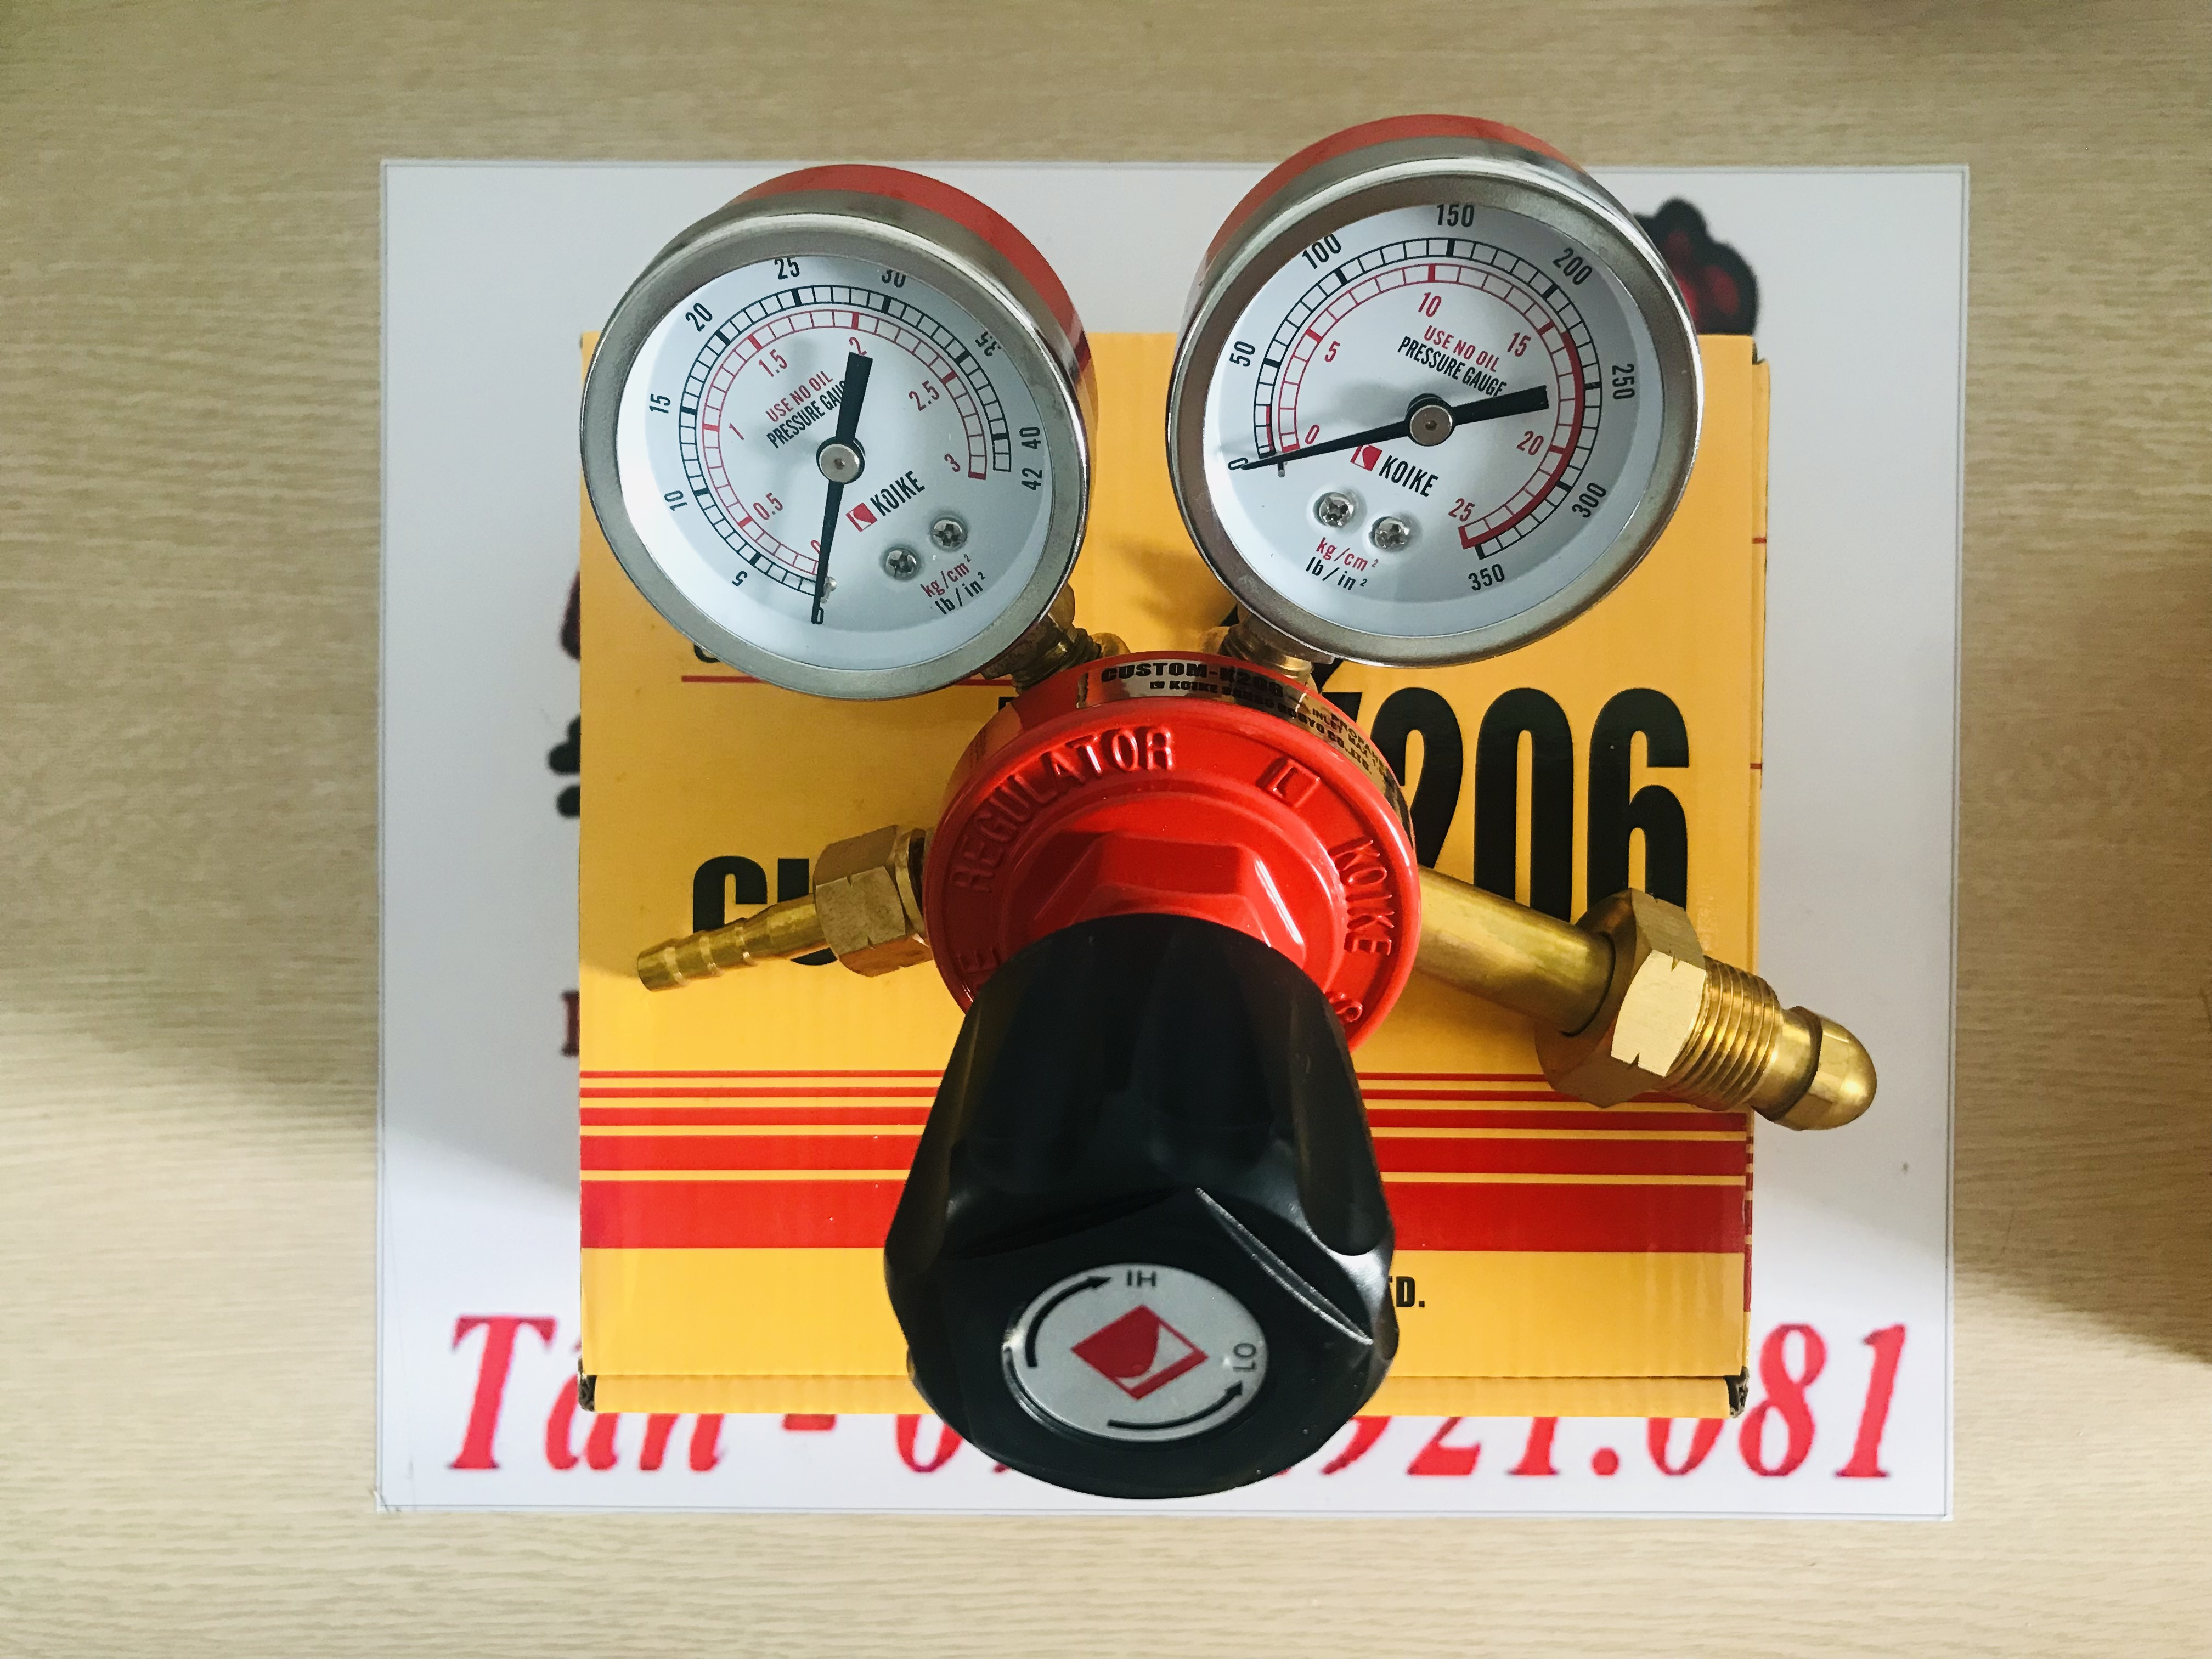 Đồng hồ Gas Koike - Custom K206 / Gas Regulator Koike